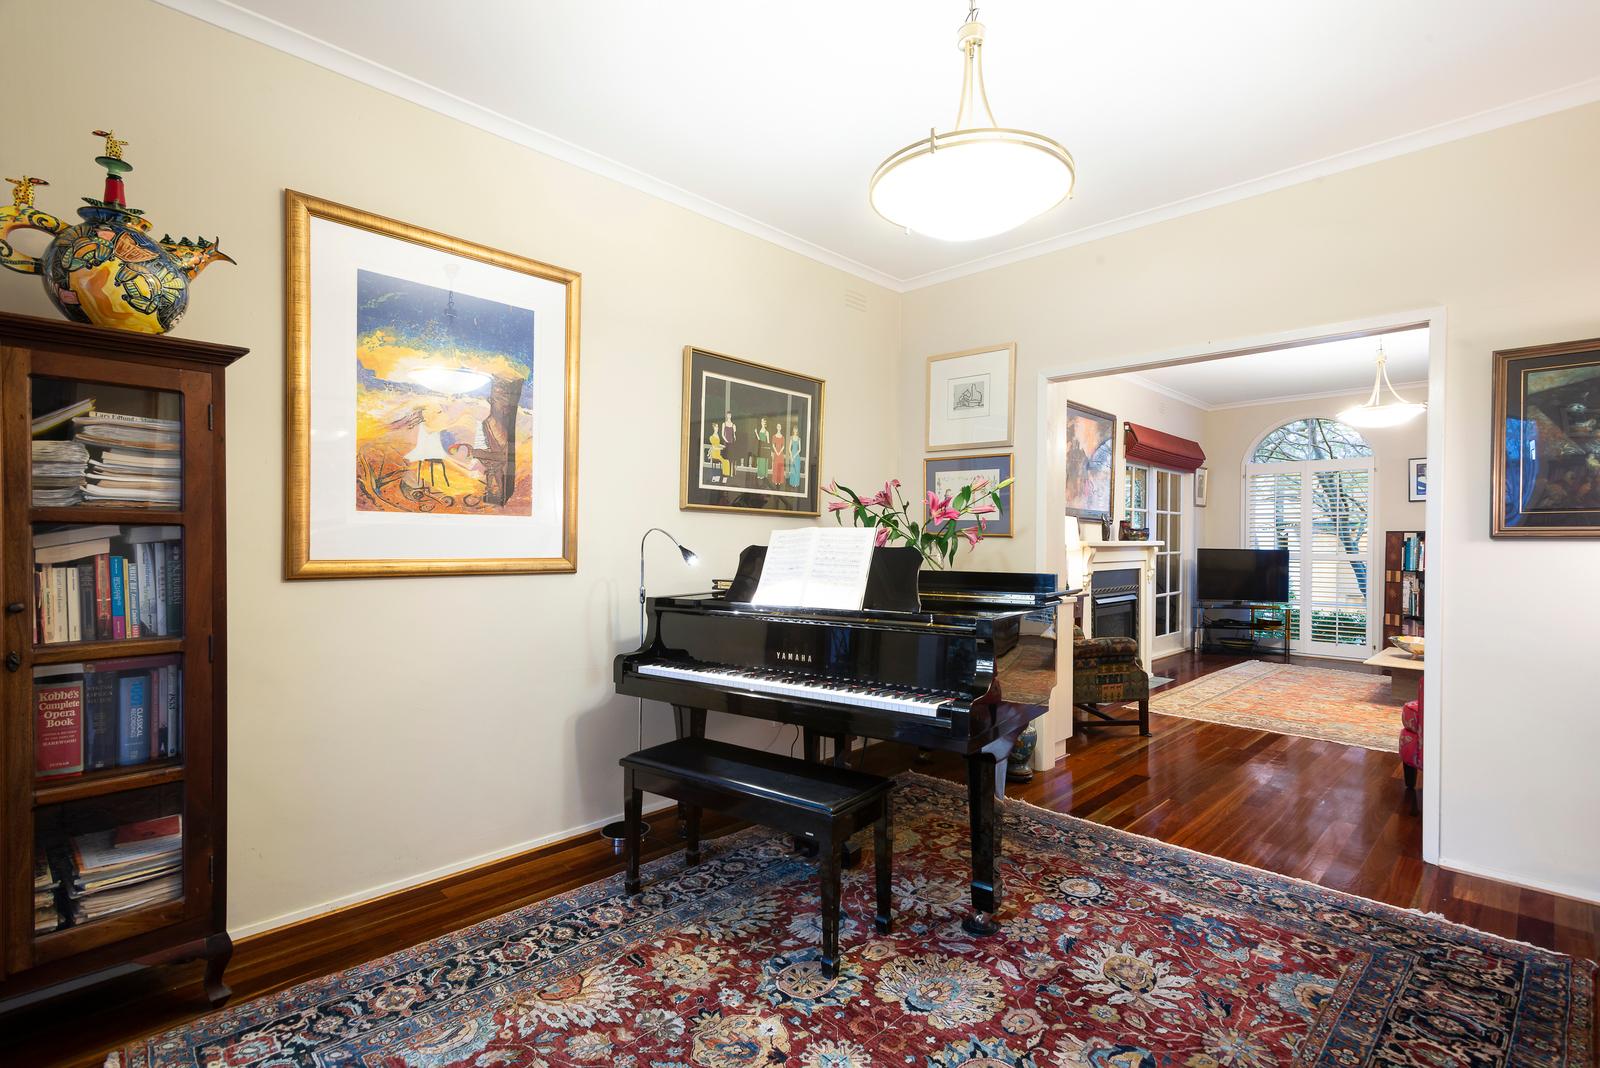 138 George Street, East Melbourne 3002 - Image 2